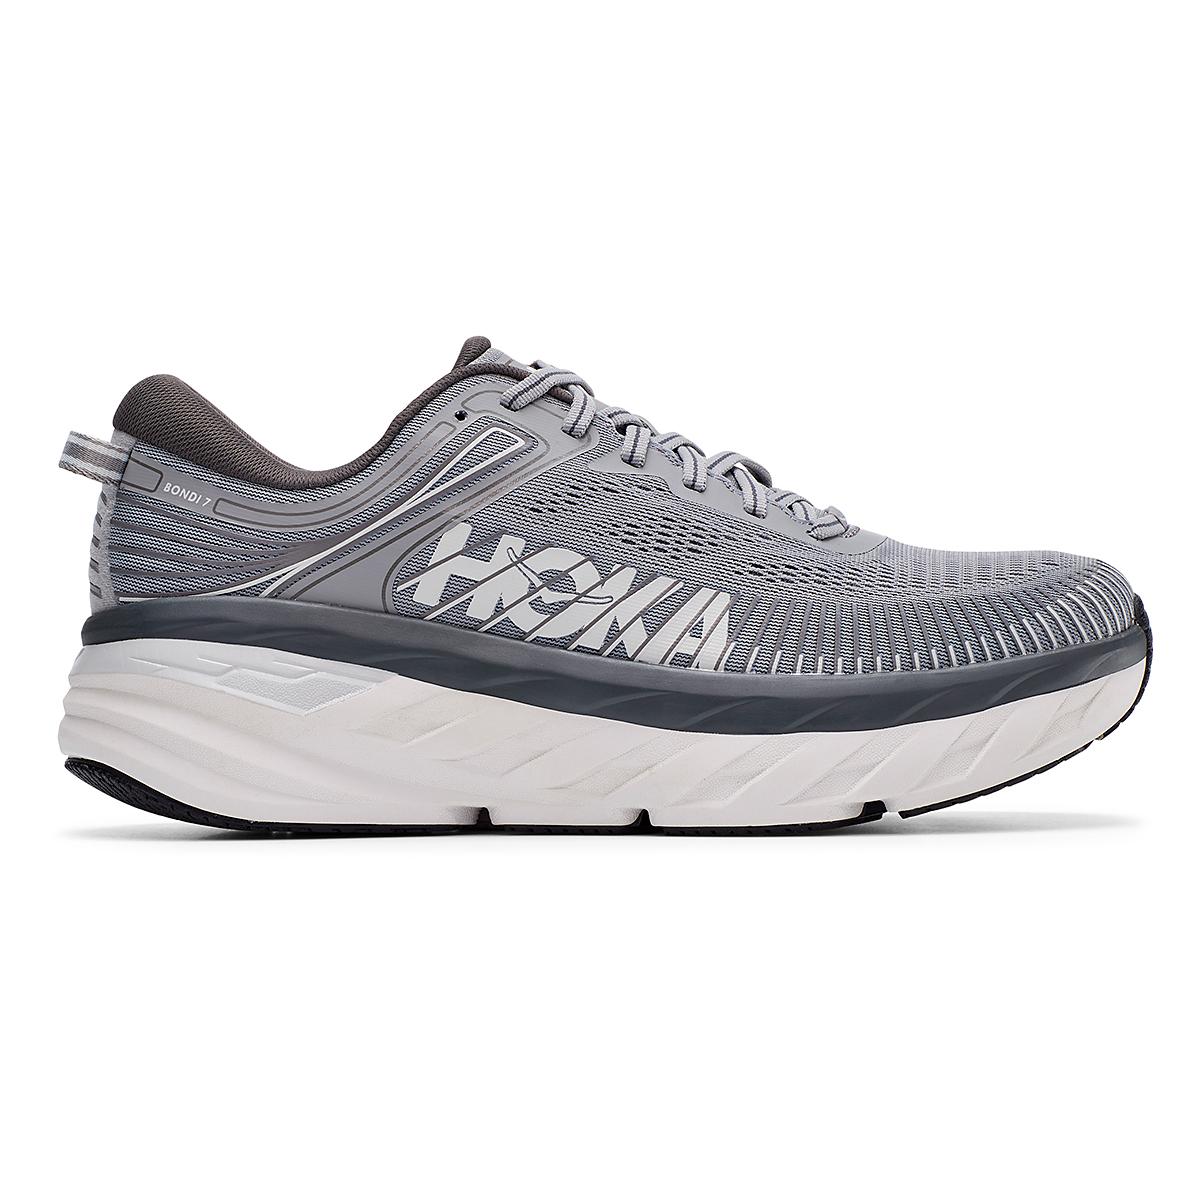 Men's Hoka One One Bondi 7 Running Shoe - Color: Wild Dove/Dark Shadow - Size: 7 - Width: Regular, Wild Dove/Dark Shadow, large, image 1